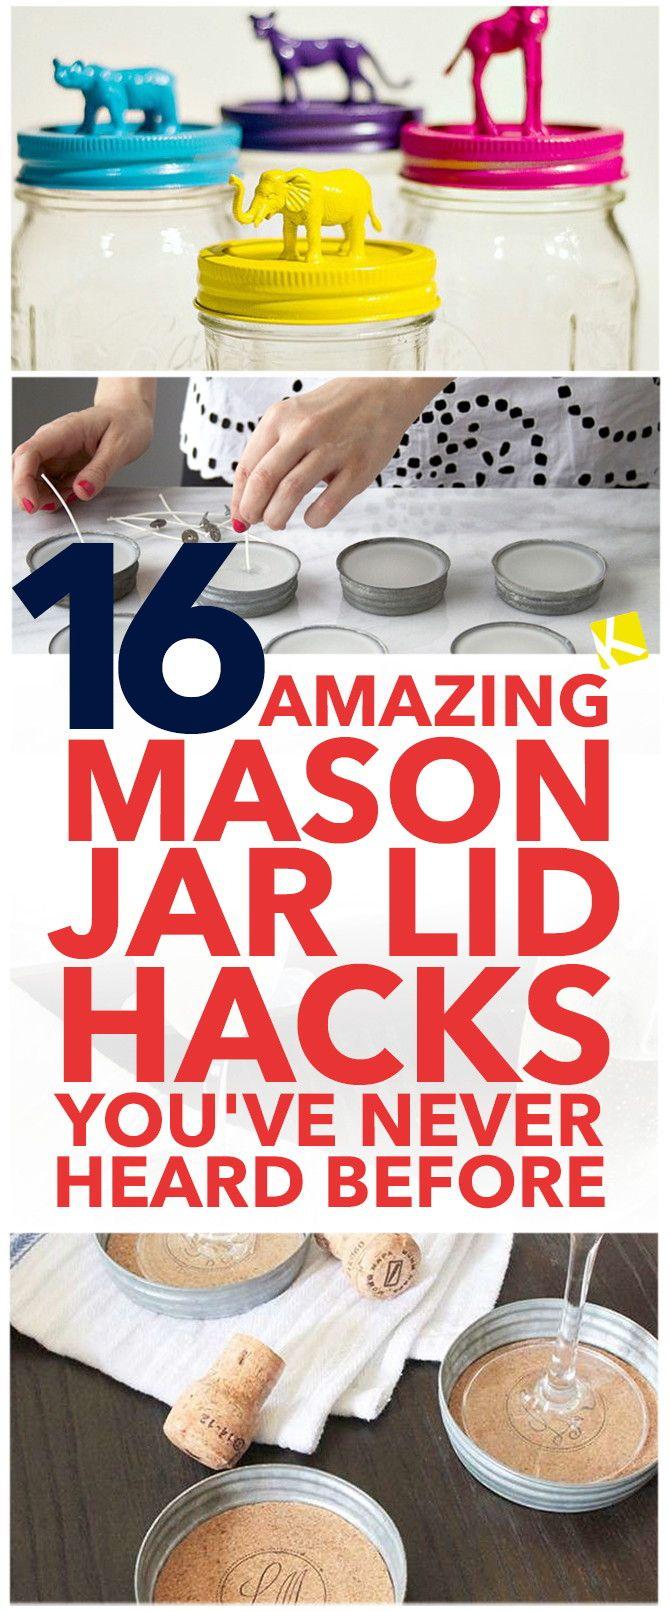 16 Amazing Mason Jar Lid Hacks You've Never Heard Before